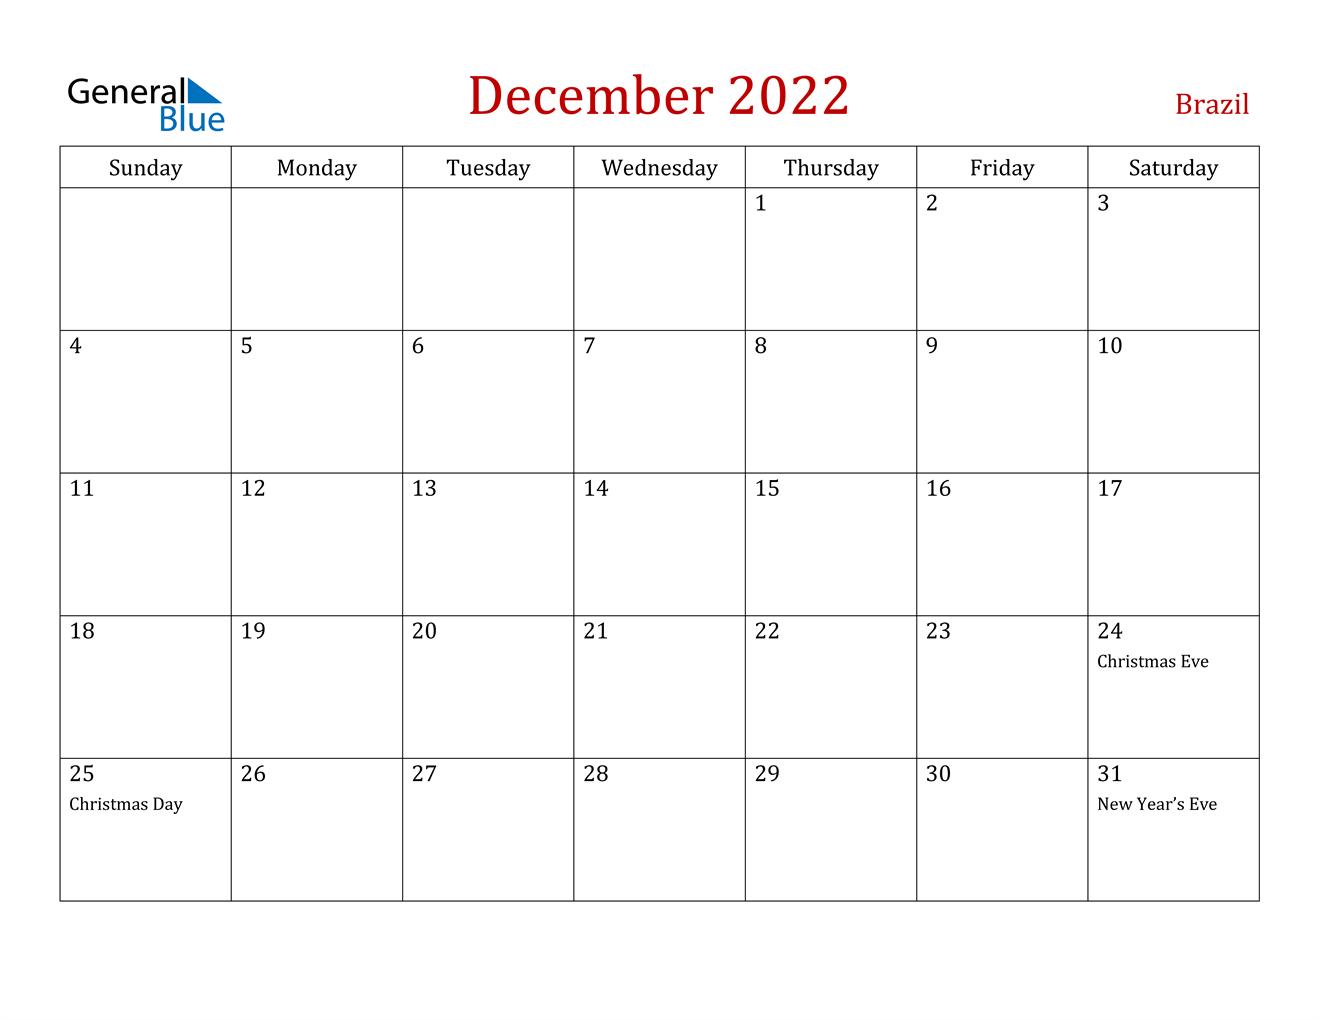 December 2022 Calendar - Brazil